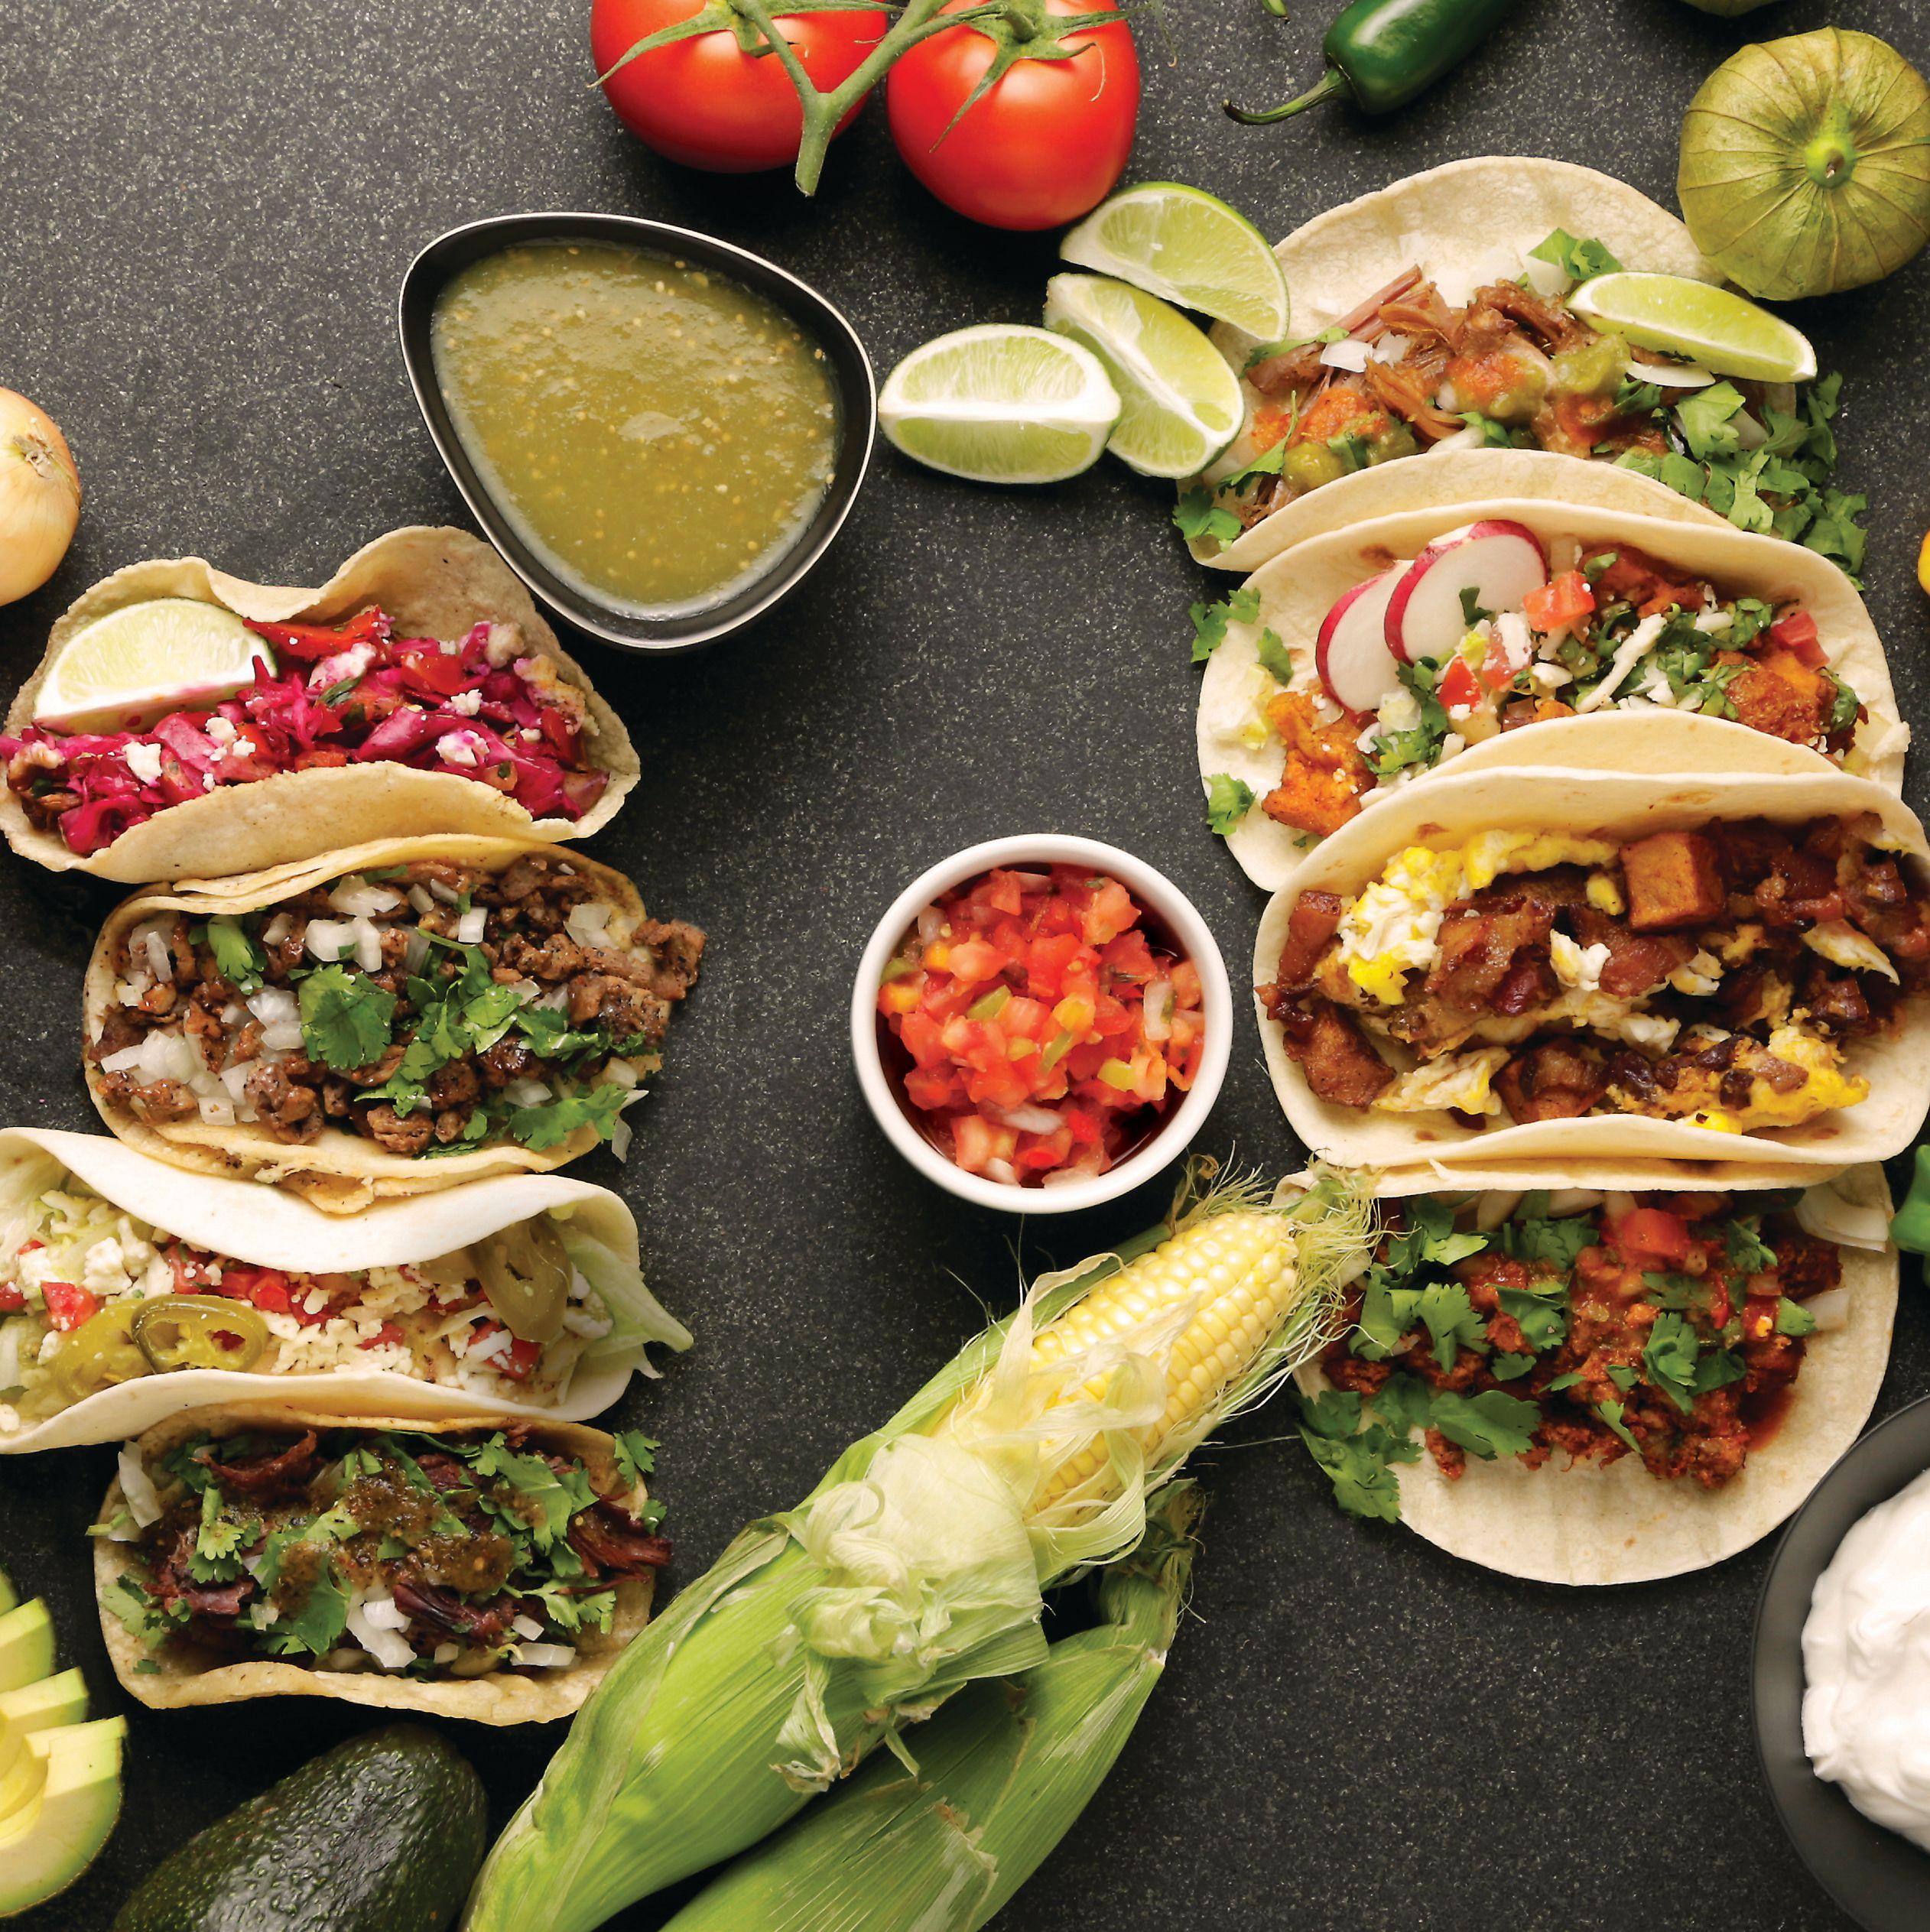 Tacos zvnnao